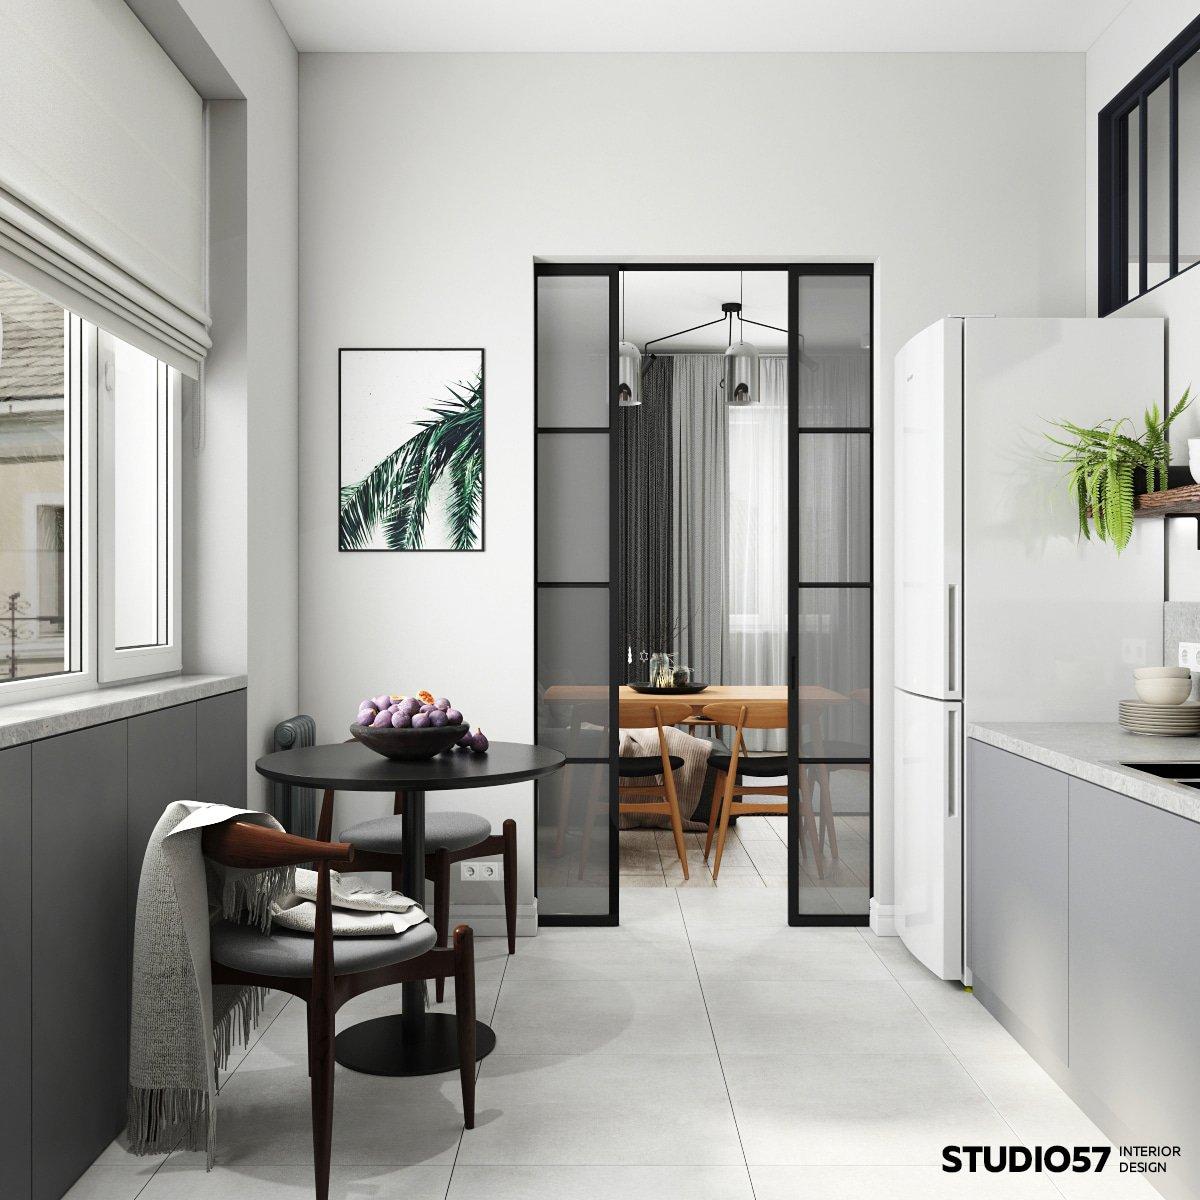 современная квартира дизайн трехкомнатной квартиры